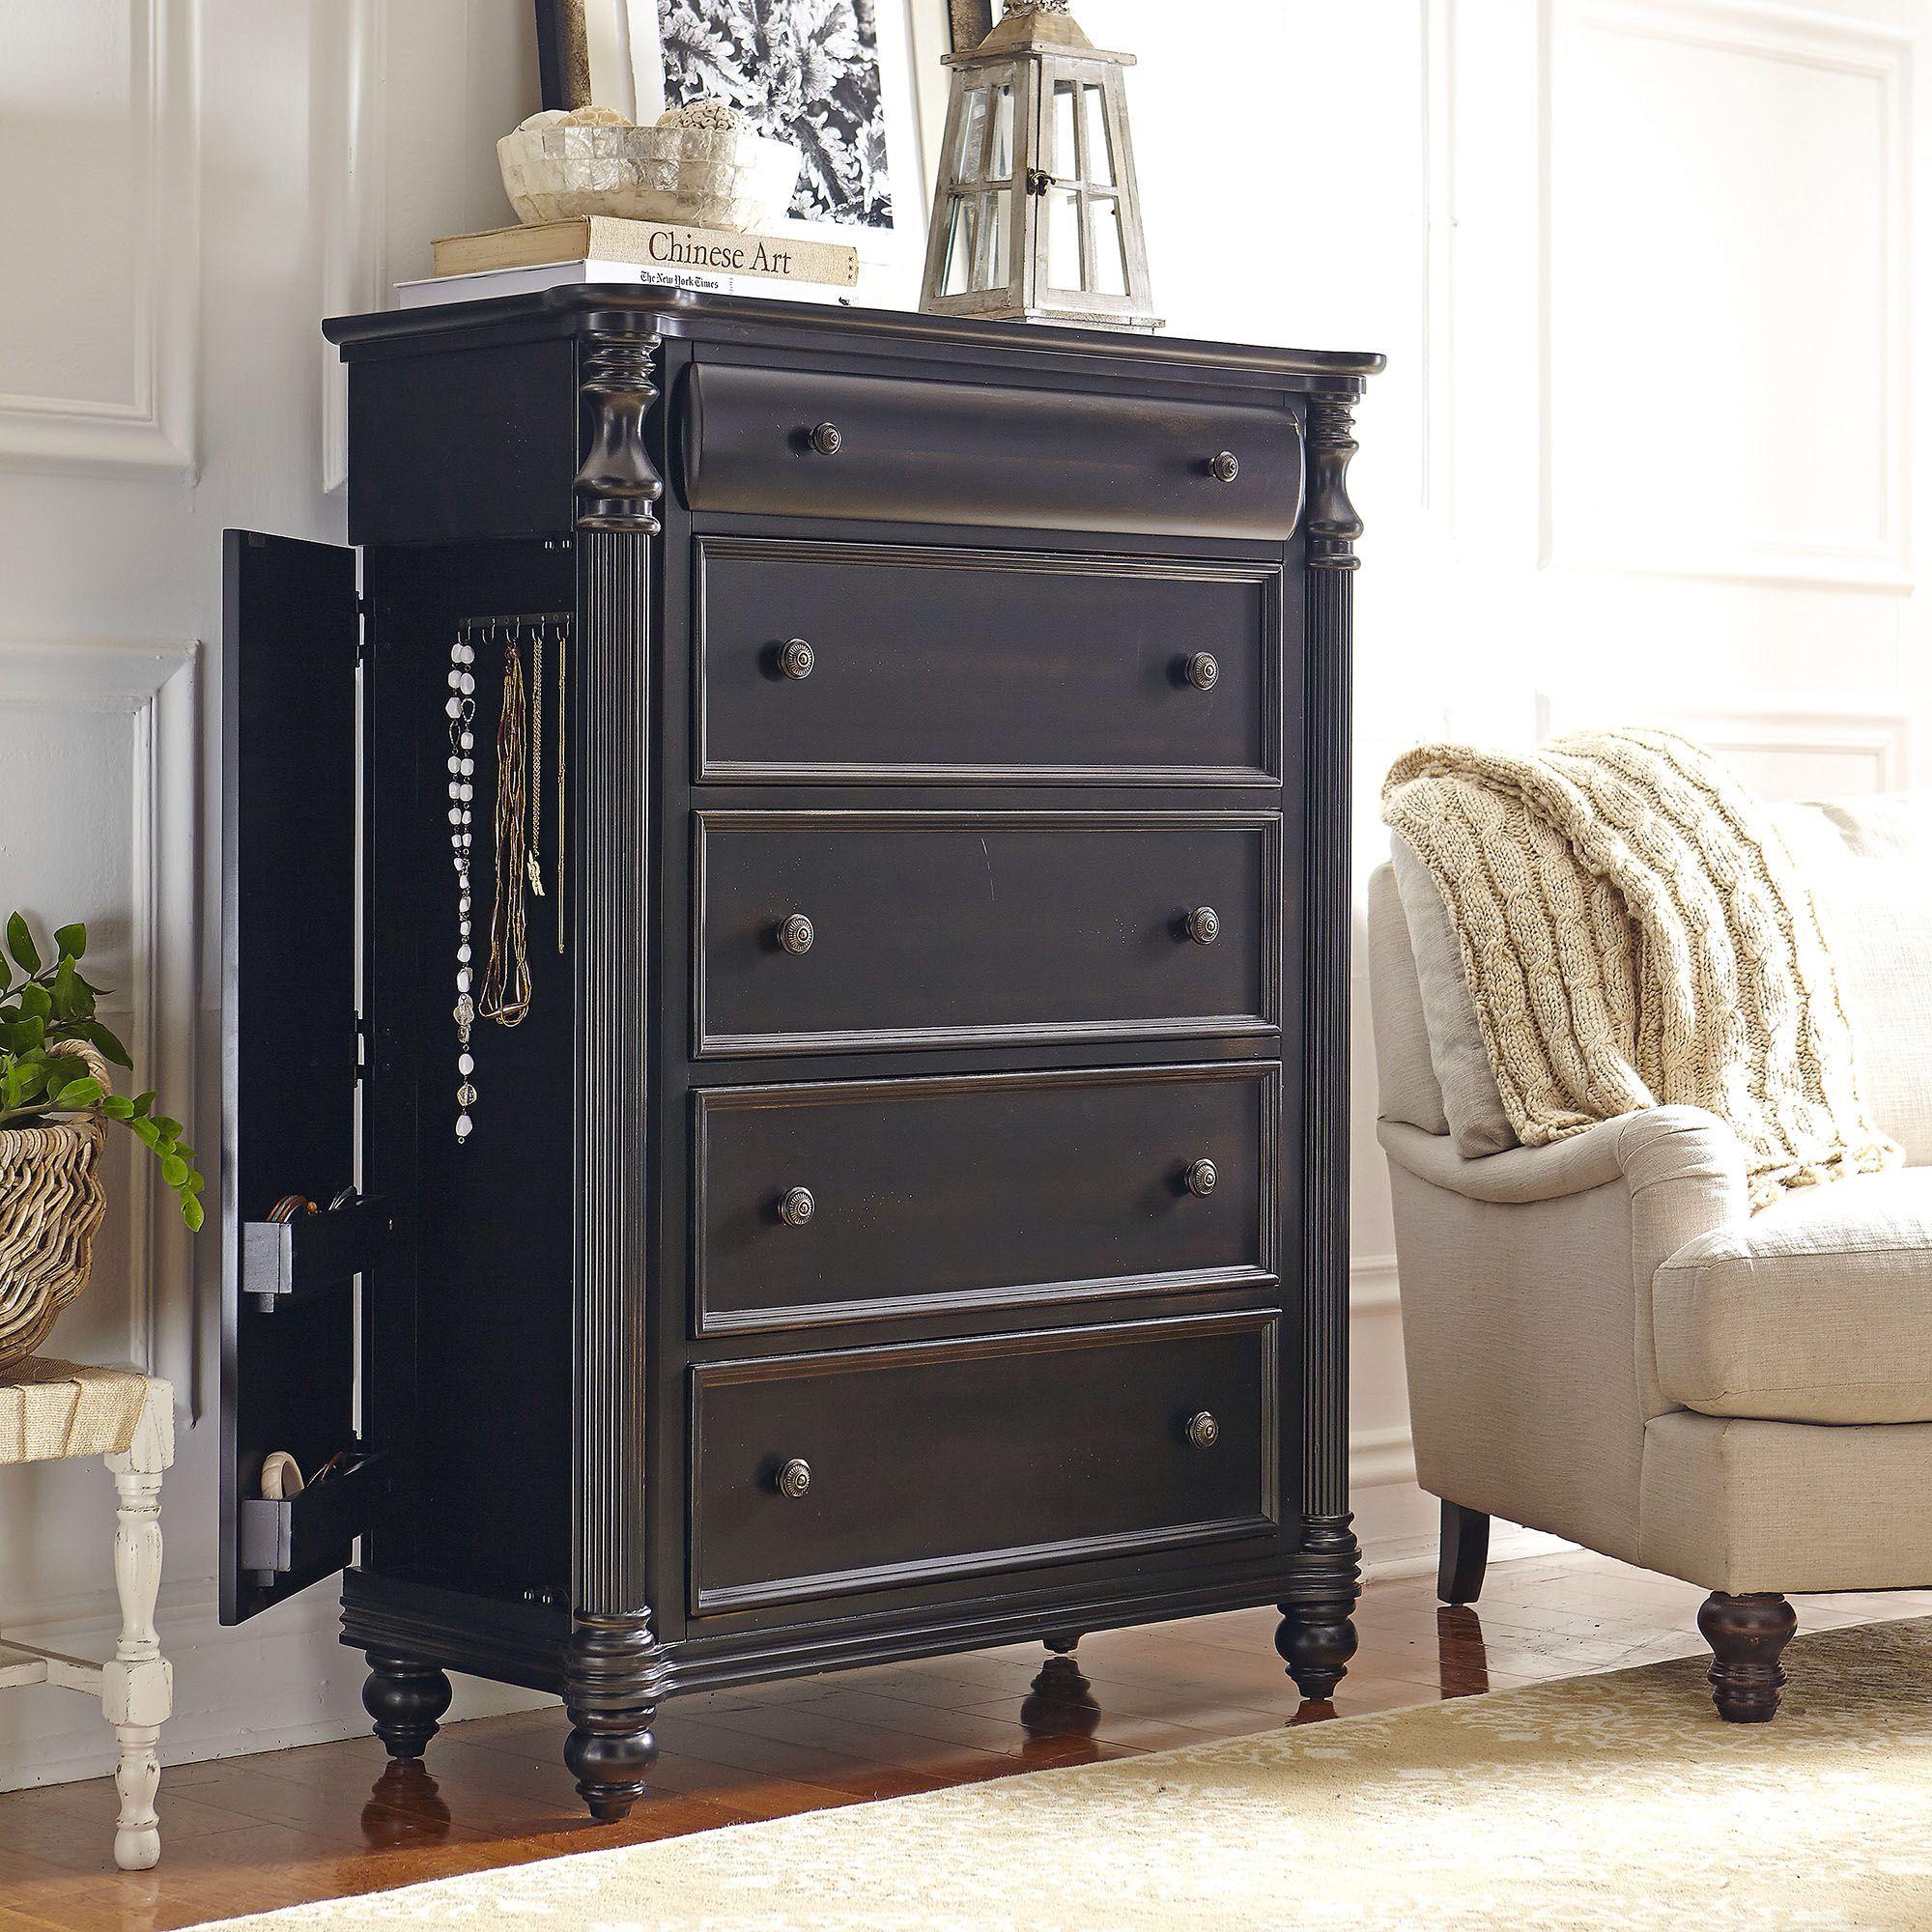 Everett Drawer Chest Bedroom furniture for sale